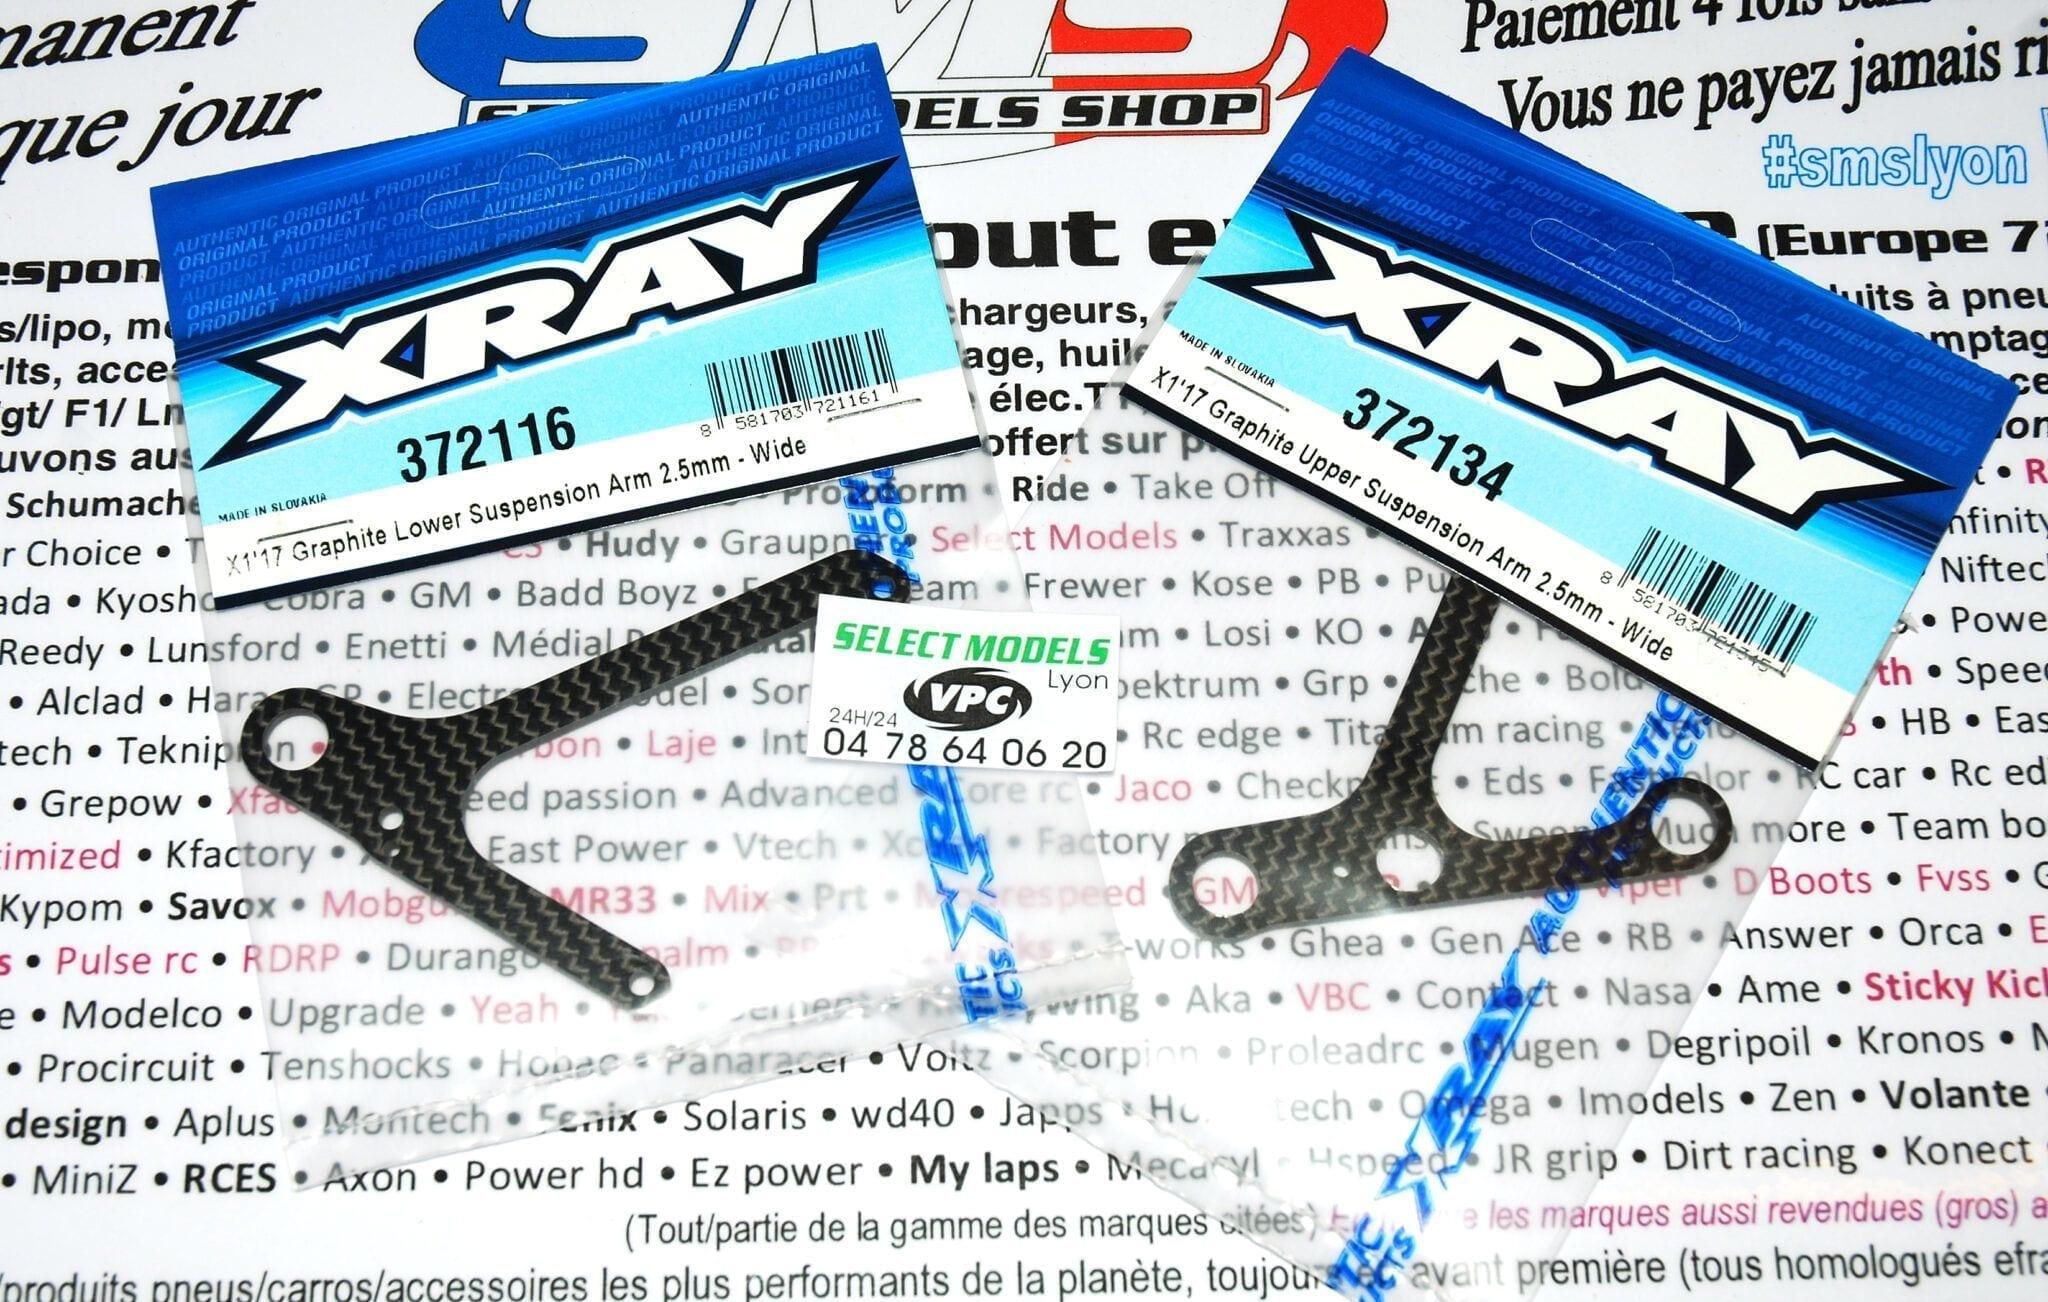 Bras av larges pour X1 Xray